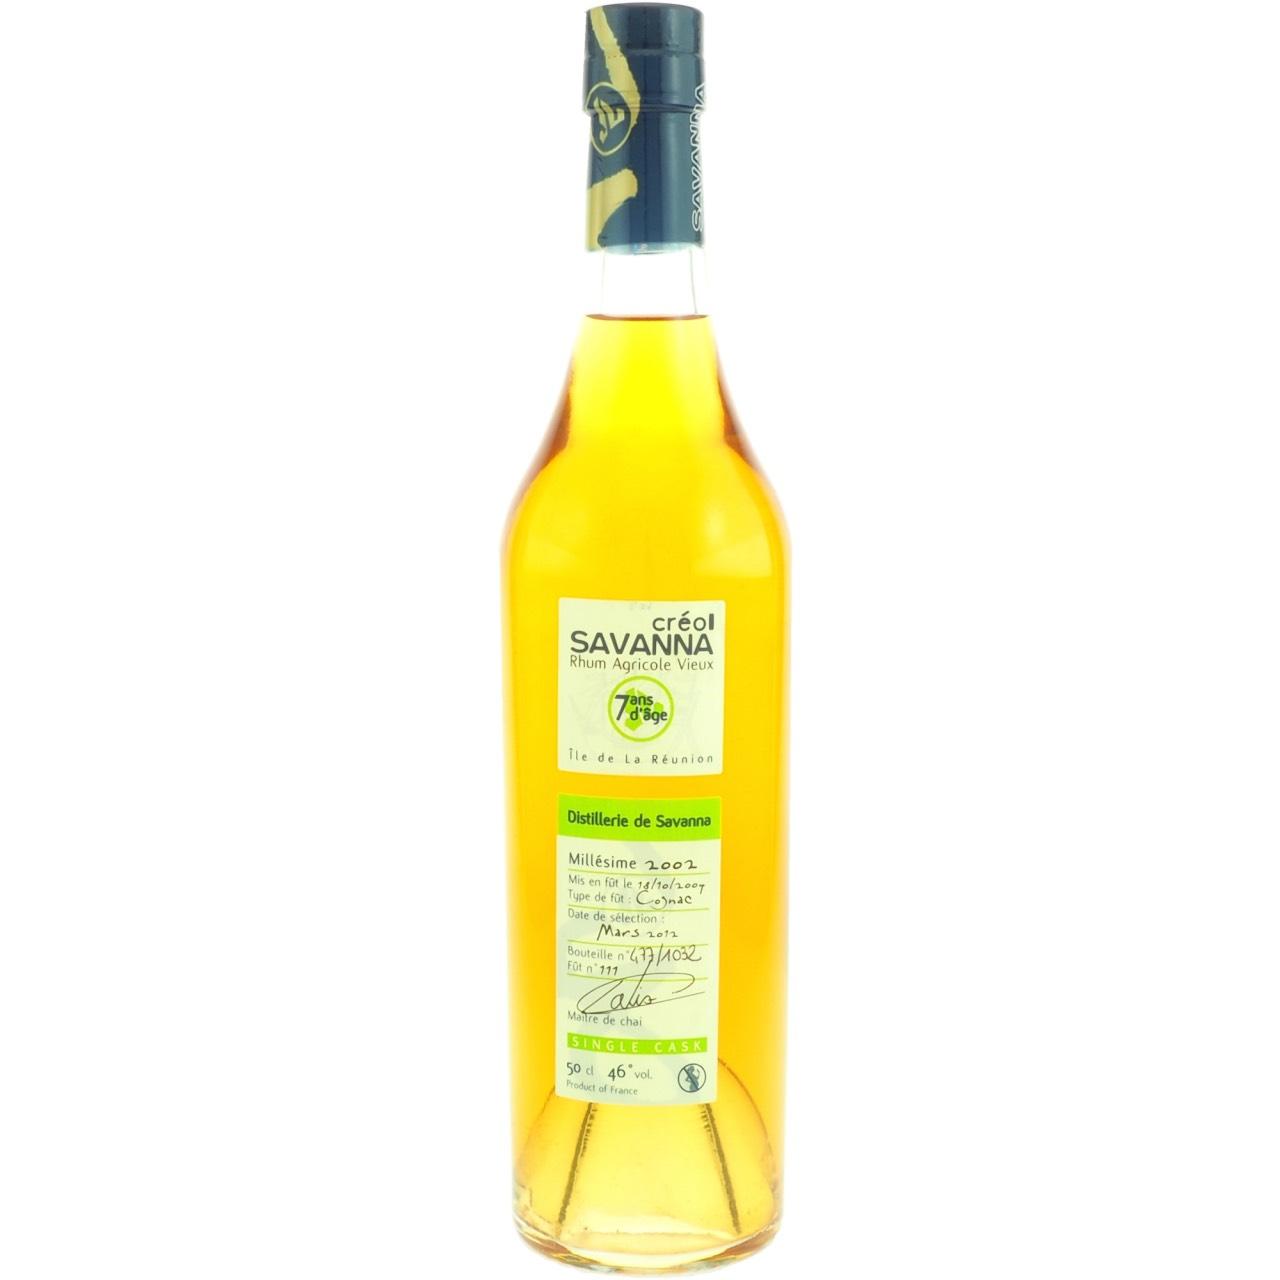 Bottle image of Créol